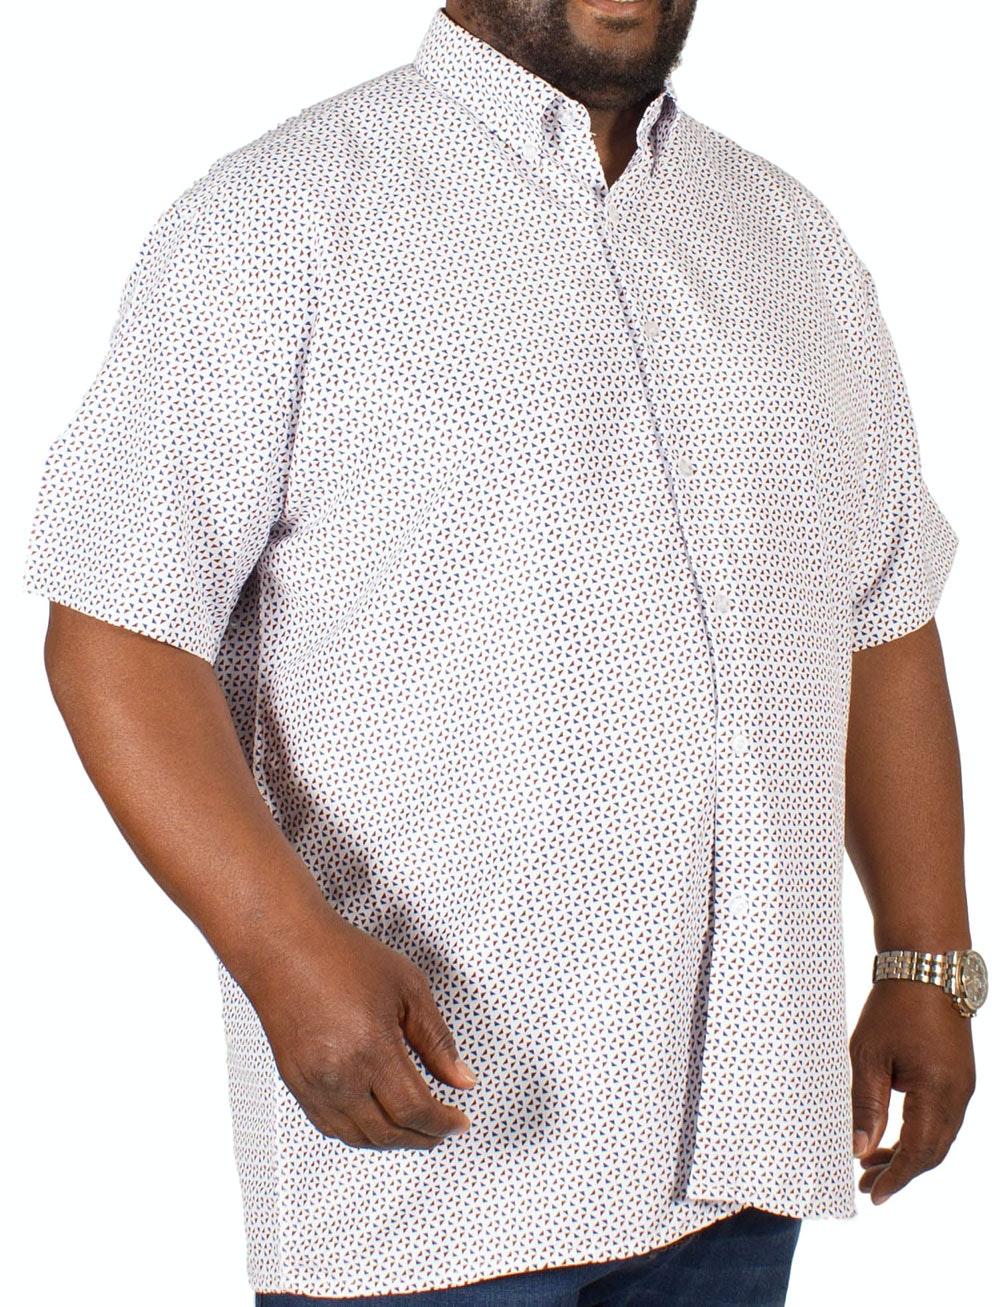 Fitzgerald Geometric Print Shirt Red/Navy